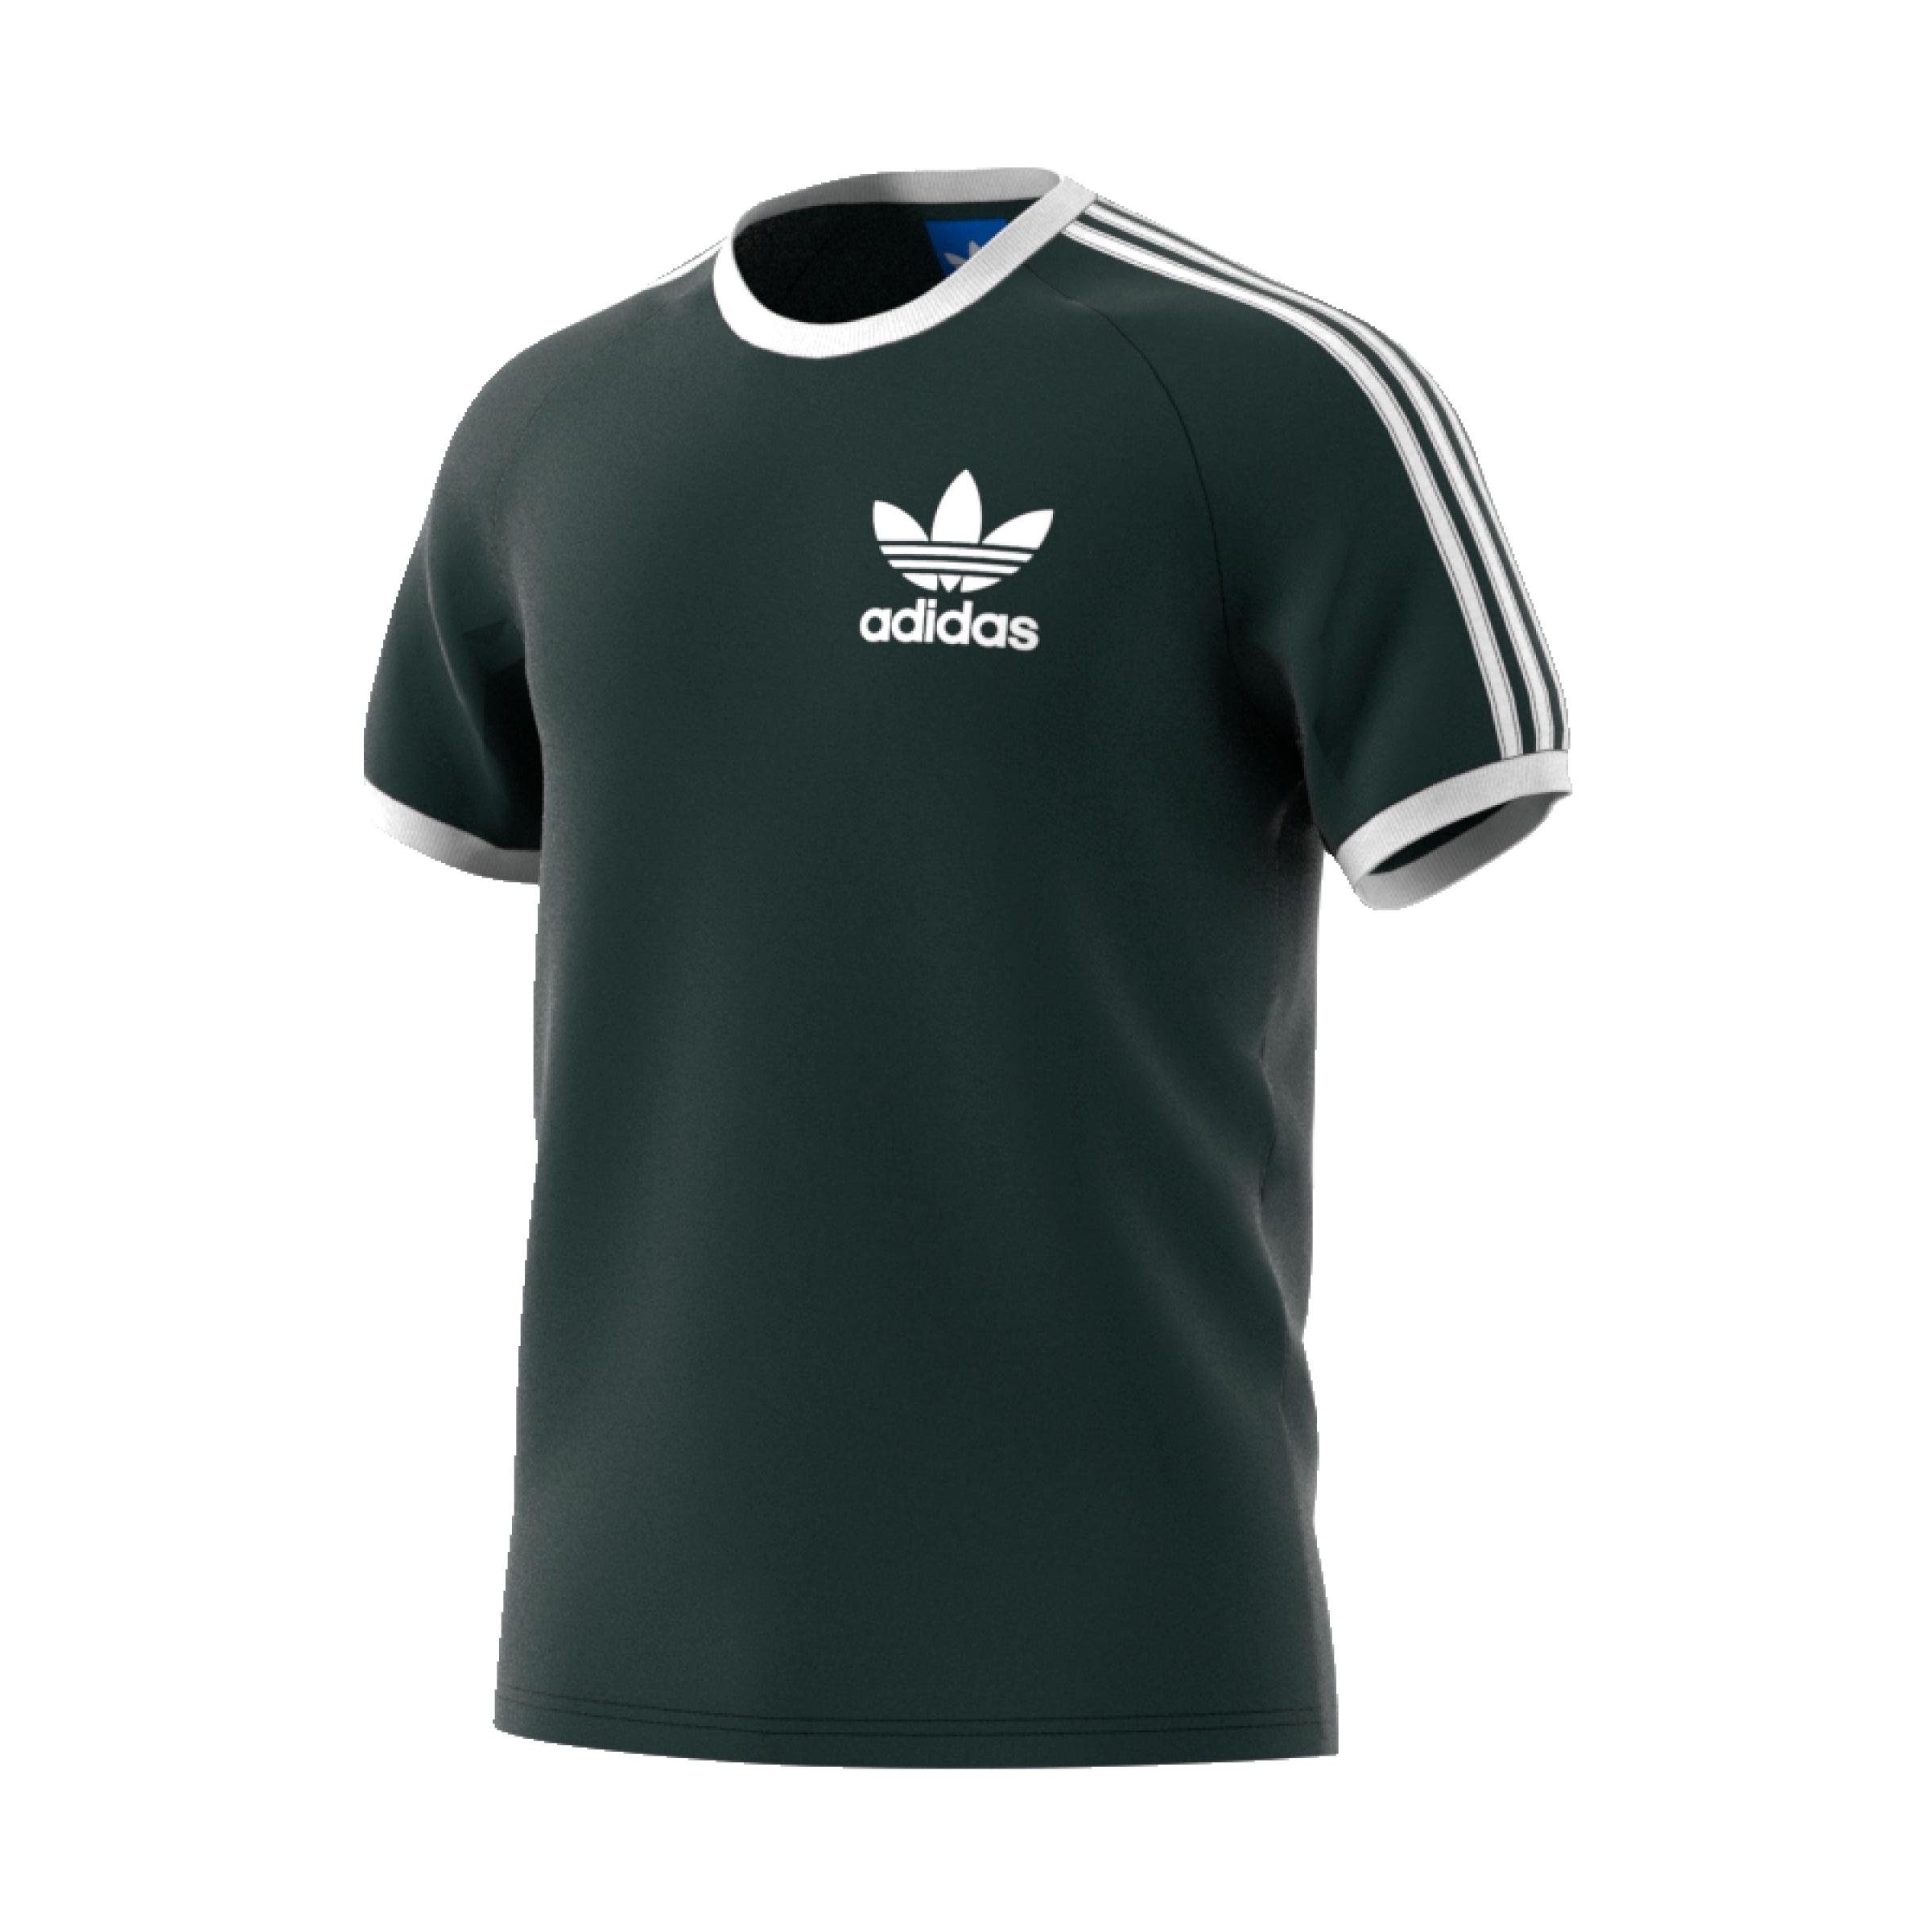 e2856fa9e Adidas Originals CLFN Tee (green night) - manelsanchez.fr